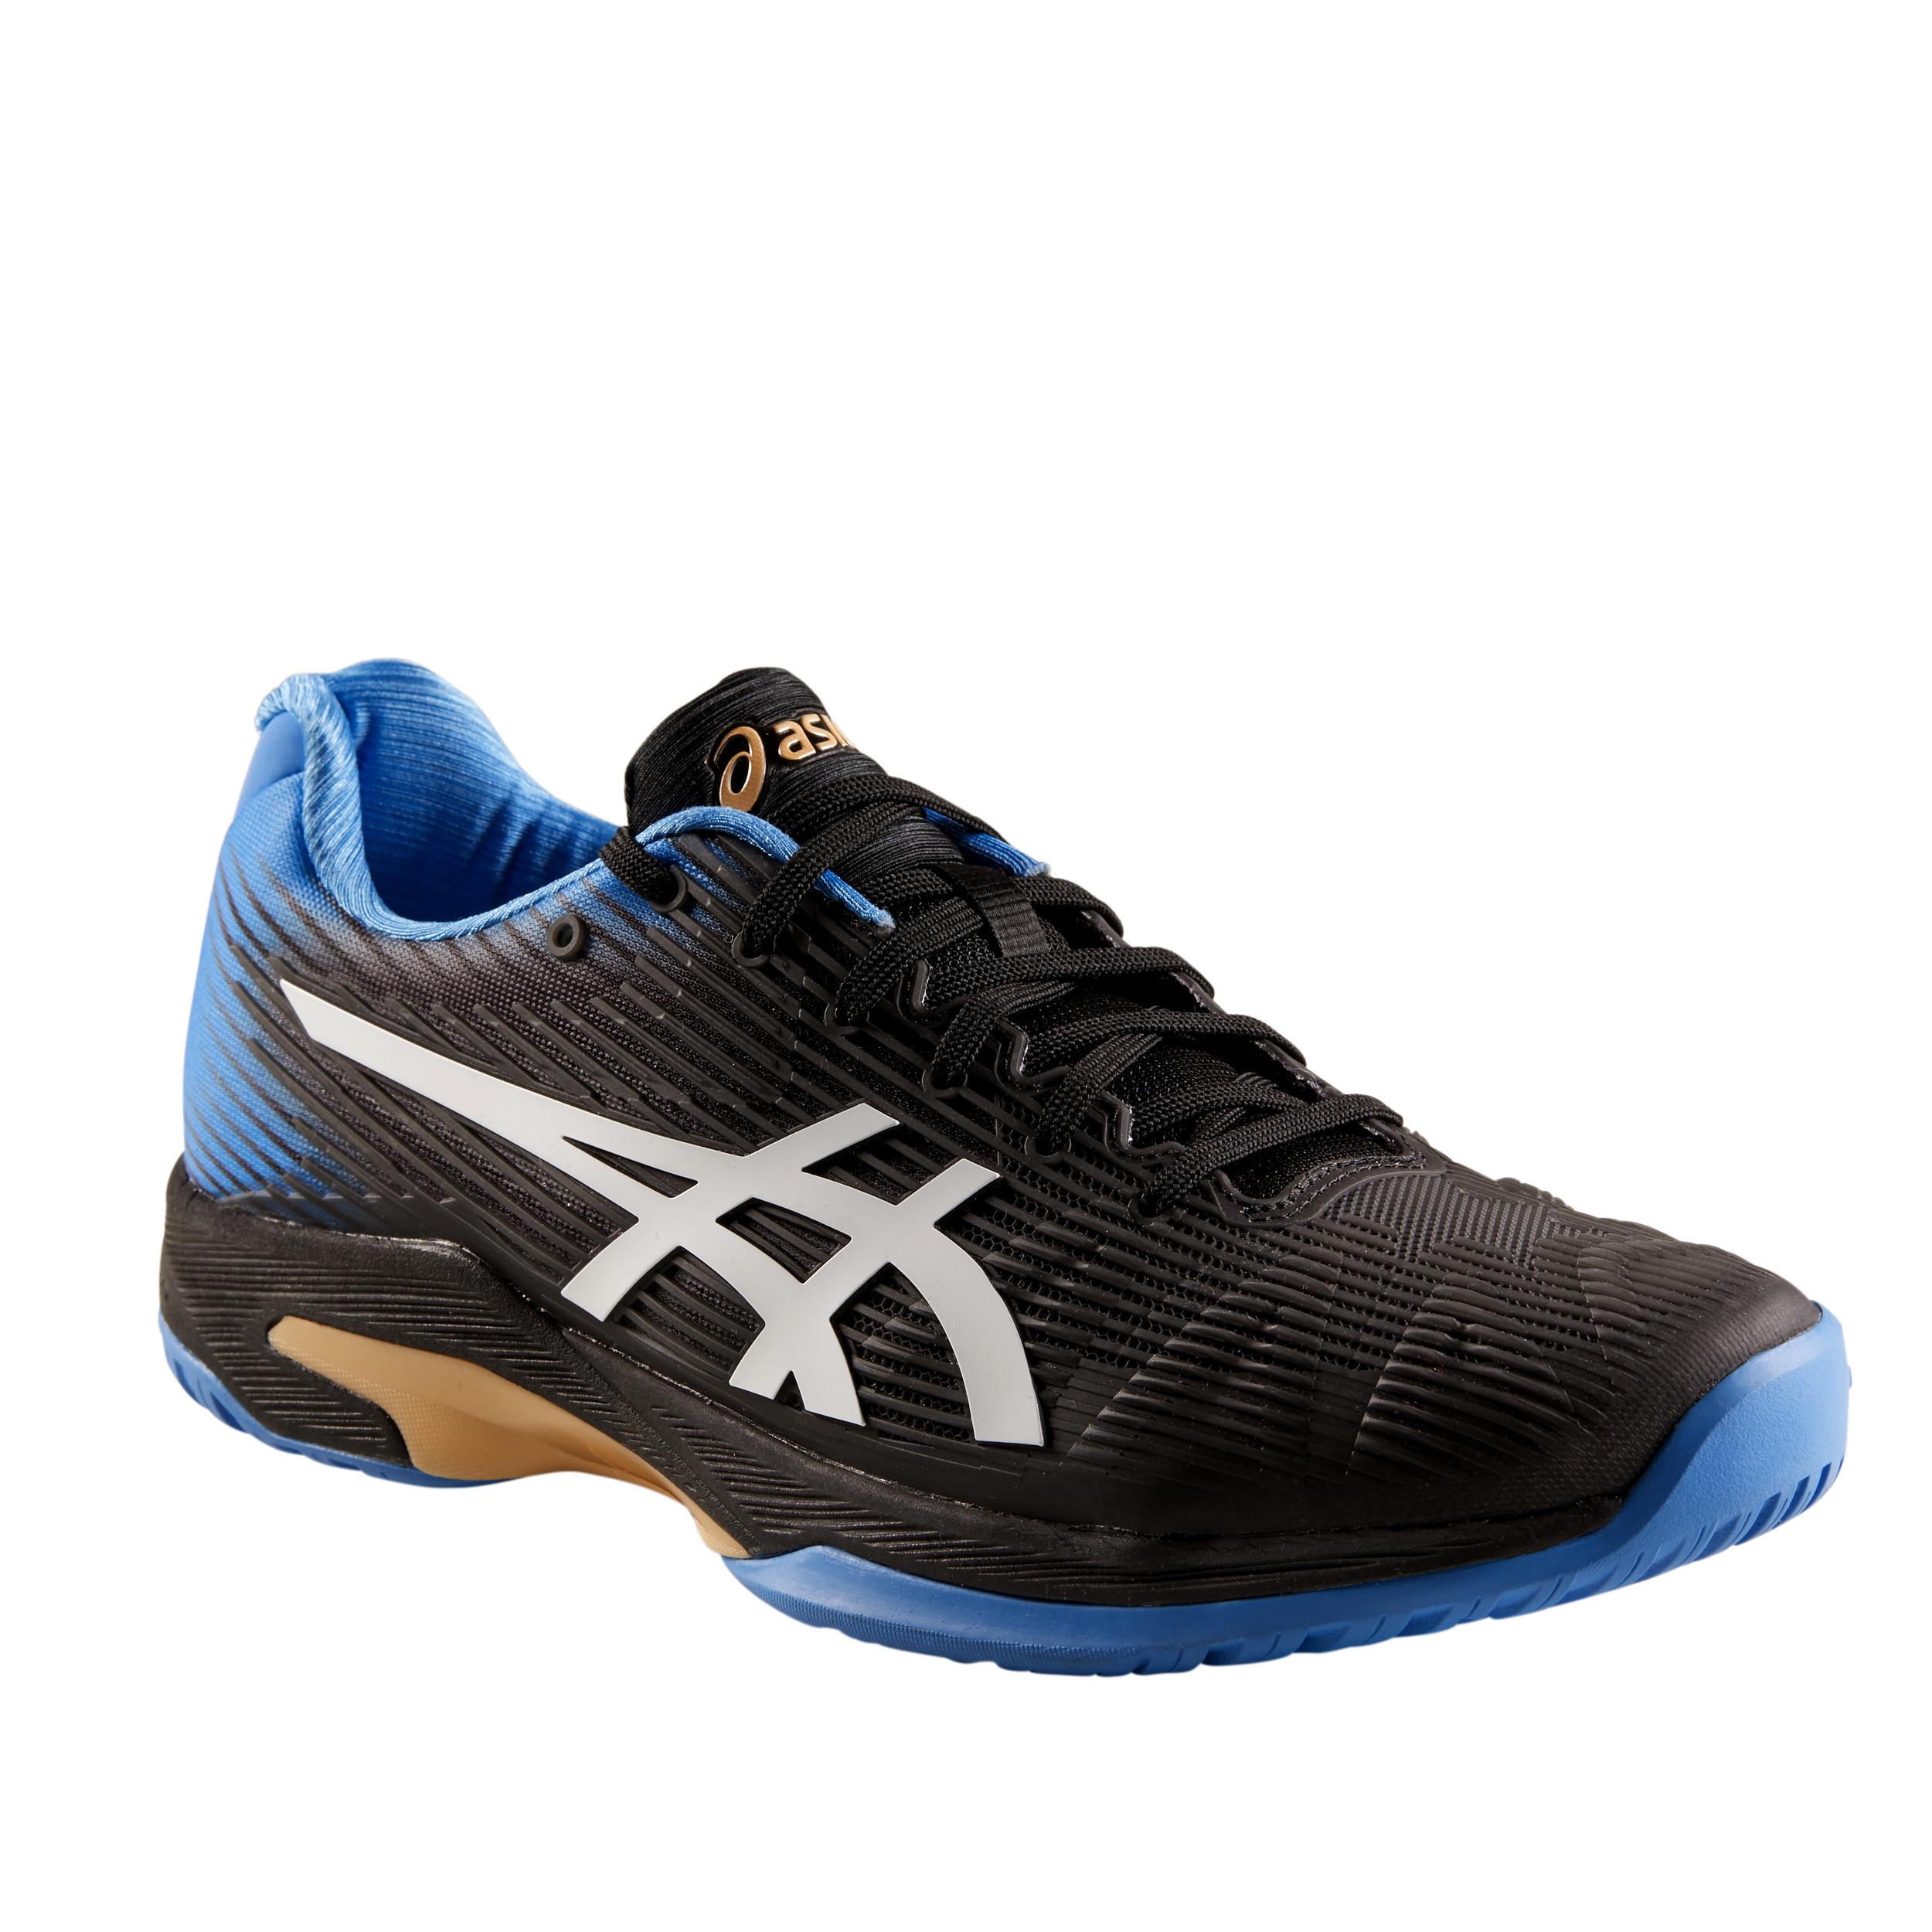 Men's Gel-Solution Speed FF Multi-Court Tennis Shoes - Black/Blue ...